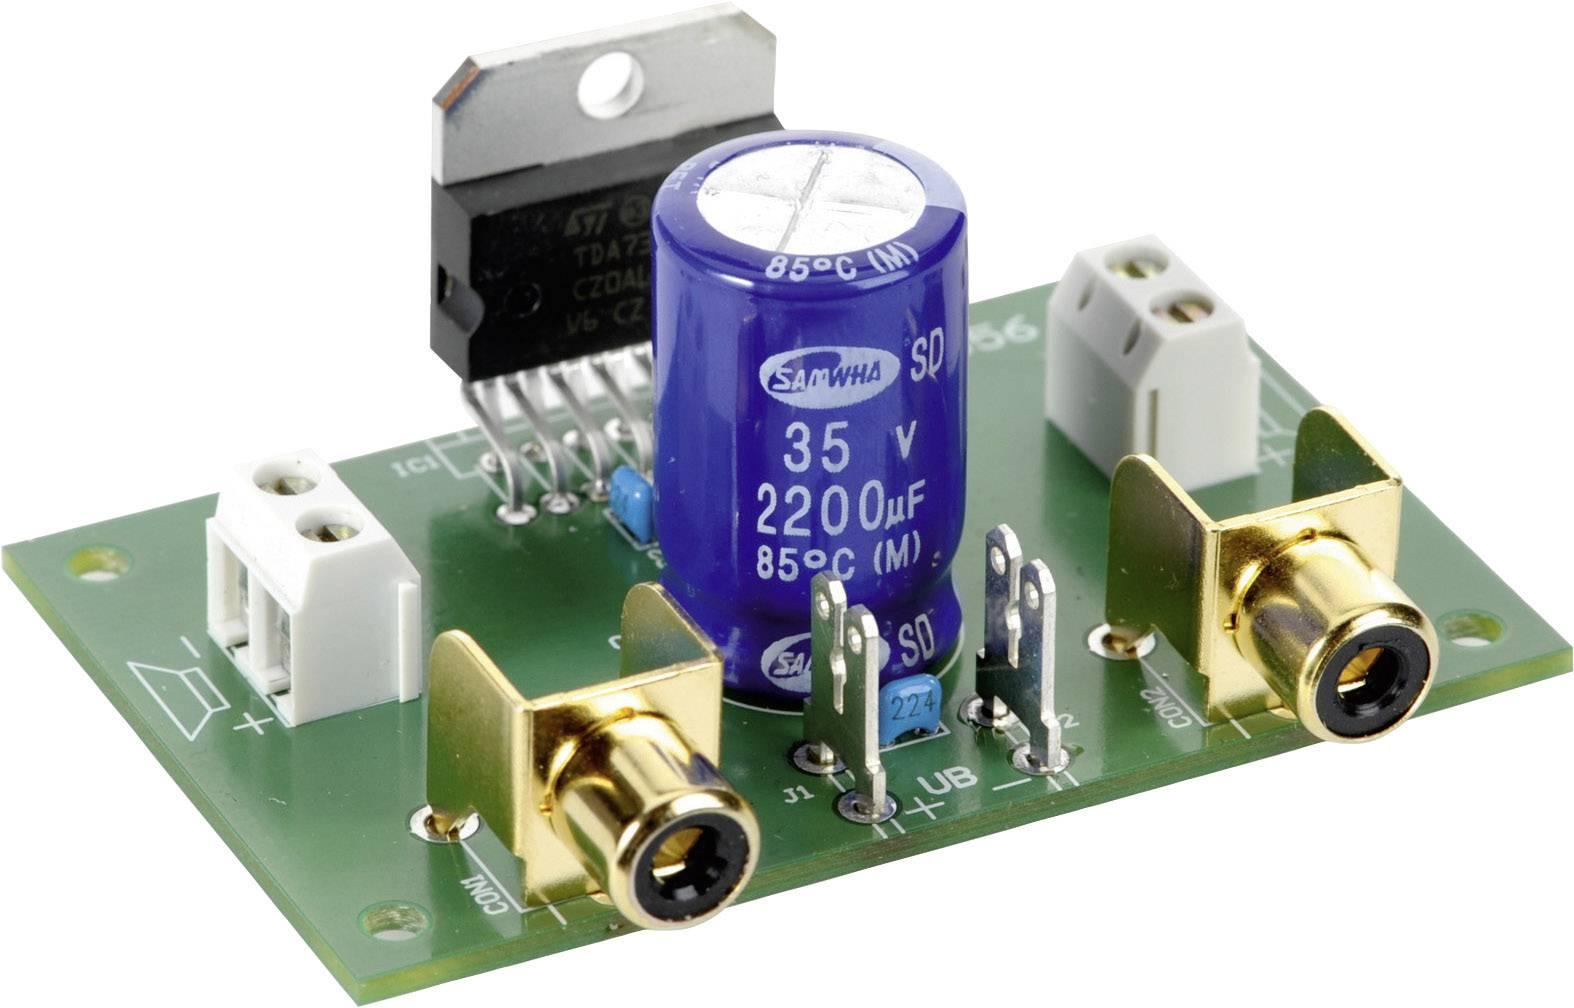 Verstrker Baustze Gnstig Online Kaufen Bei Conrad 2 X 40 Watt Stk Amplifier Components Stereo Bausatz 9 V Dc 12